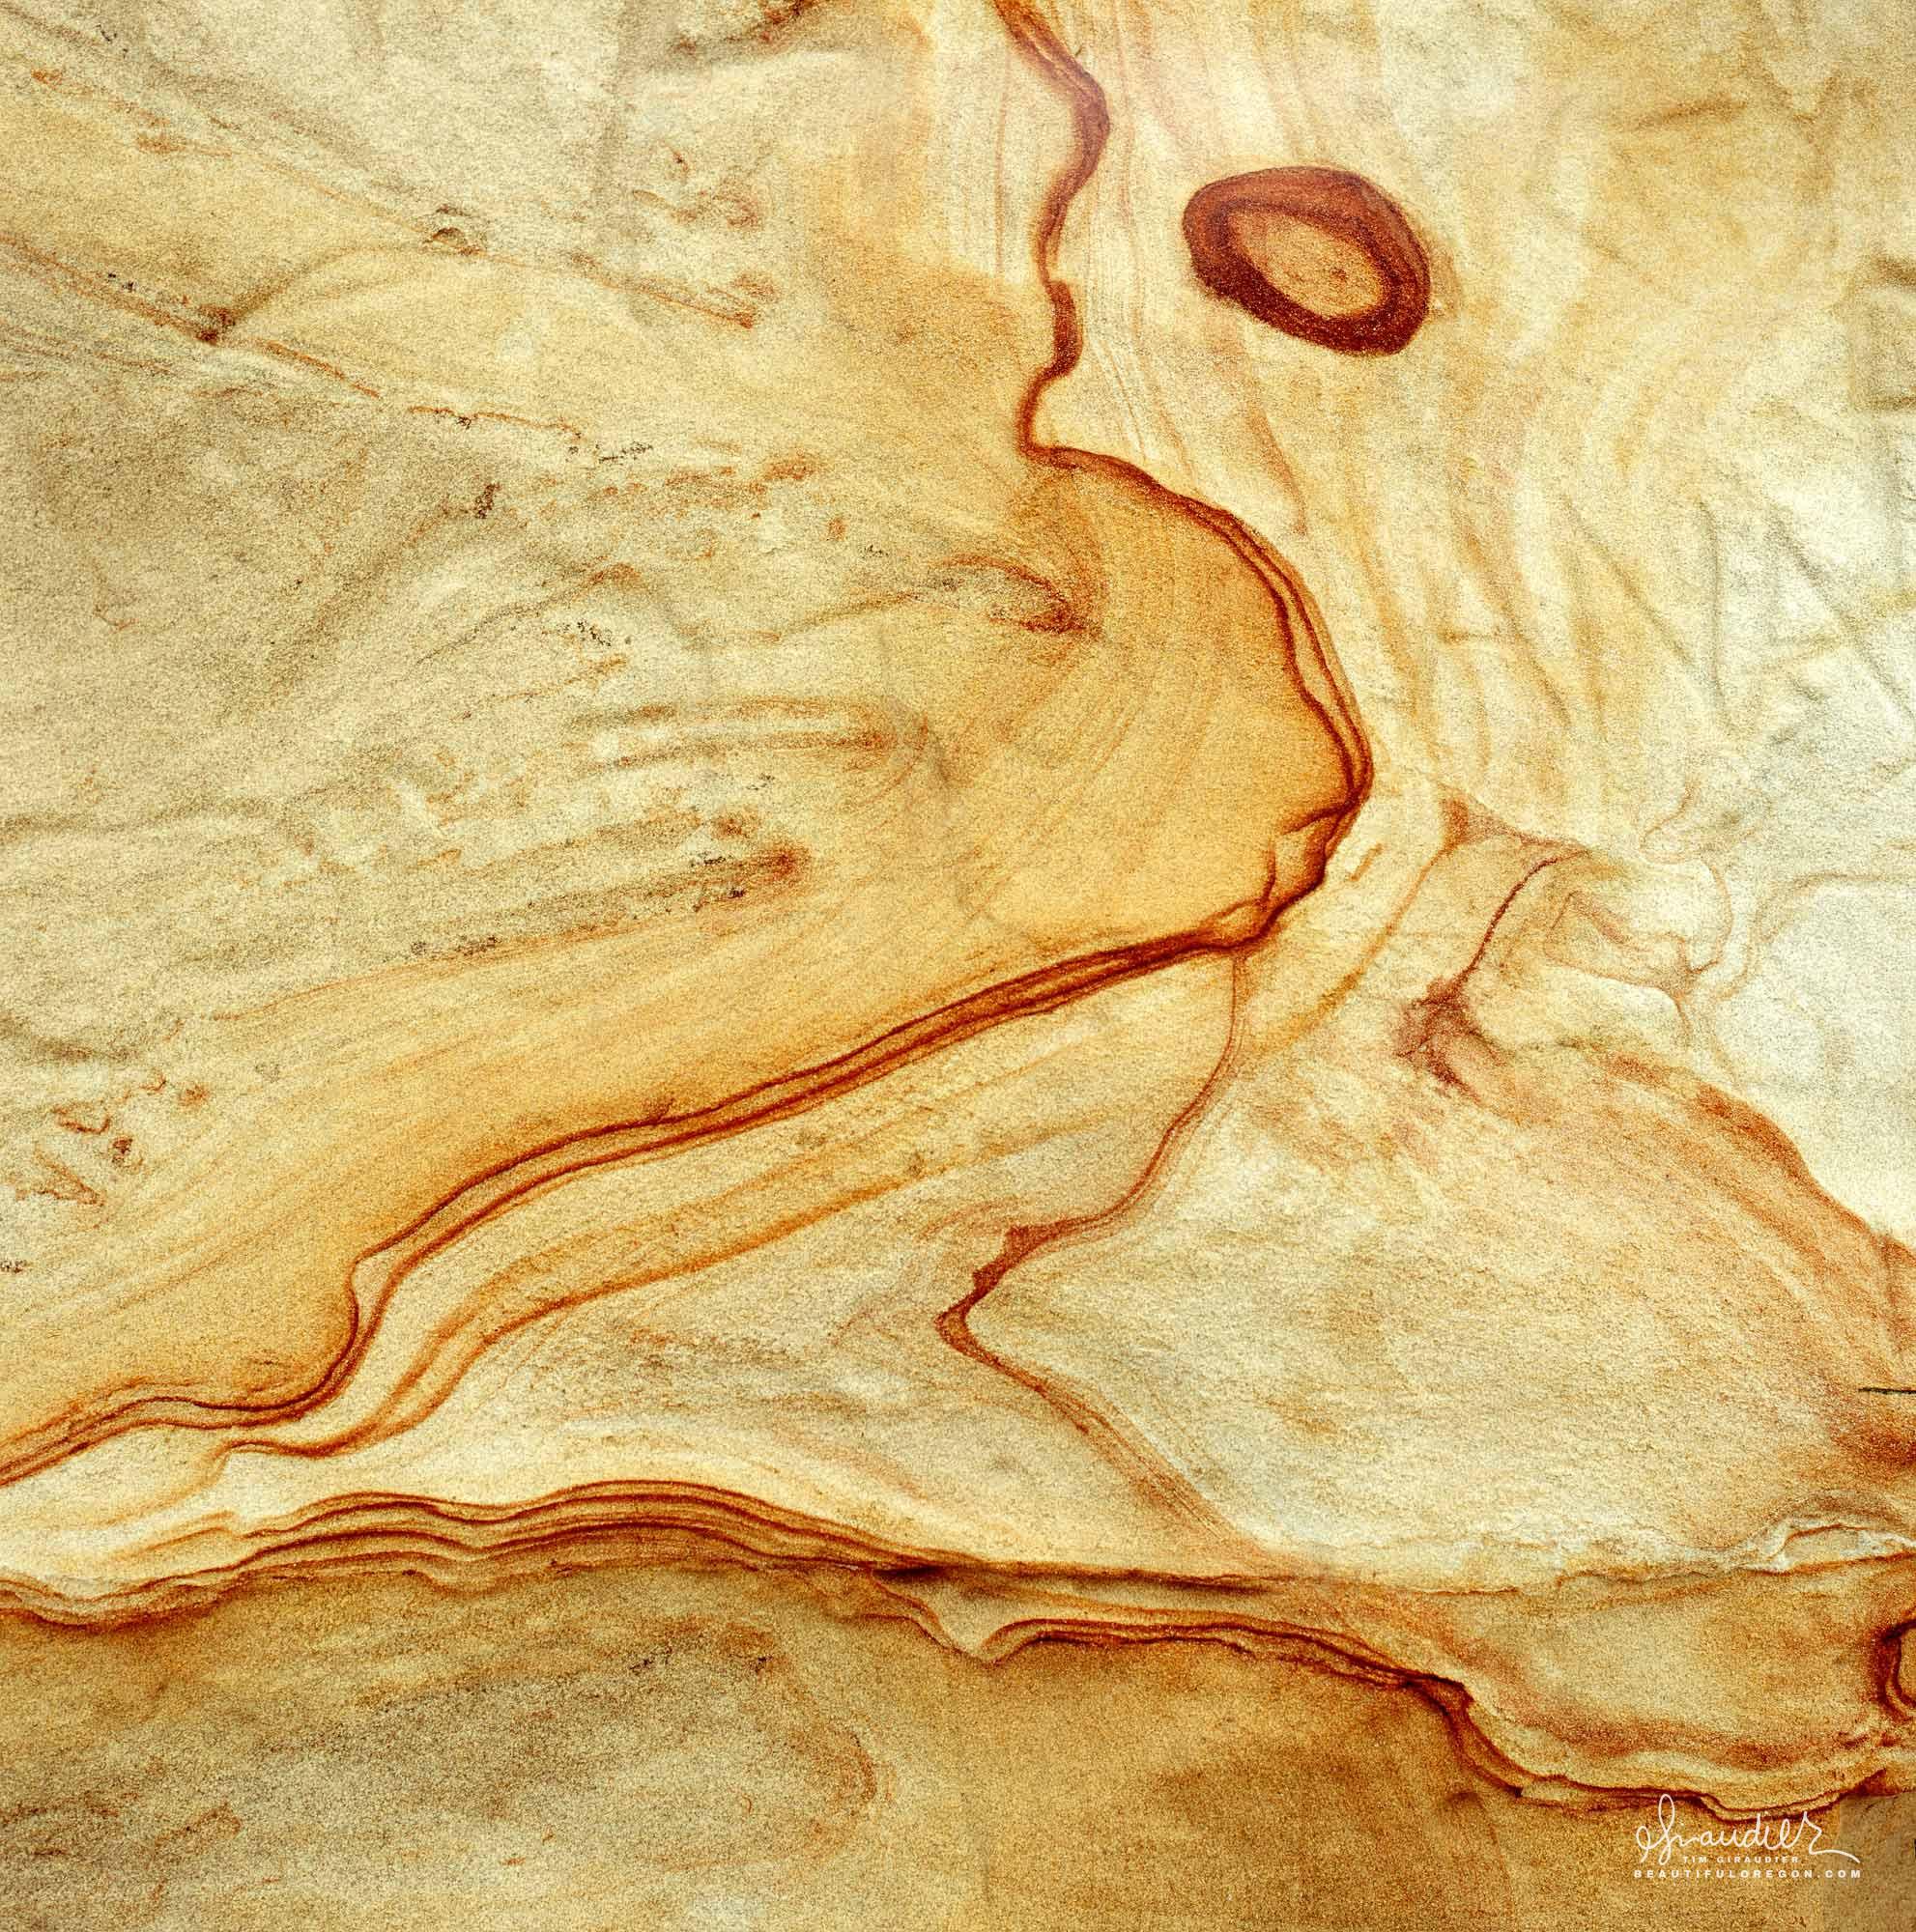 Roosevelt Beach Sandstone and iron oxide bluff along Oregon Coast.